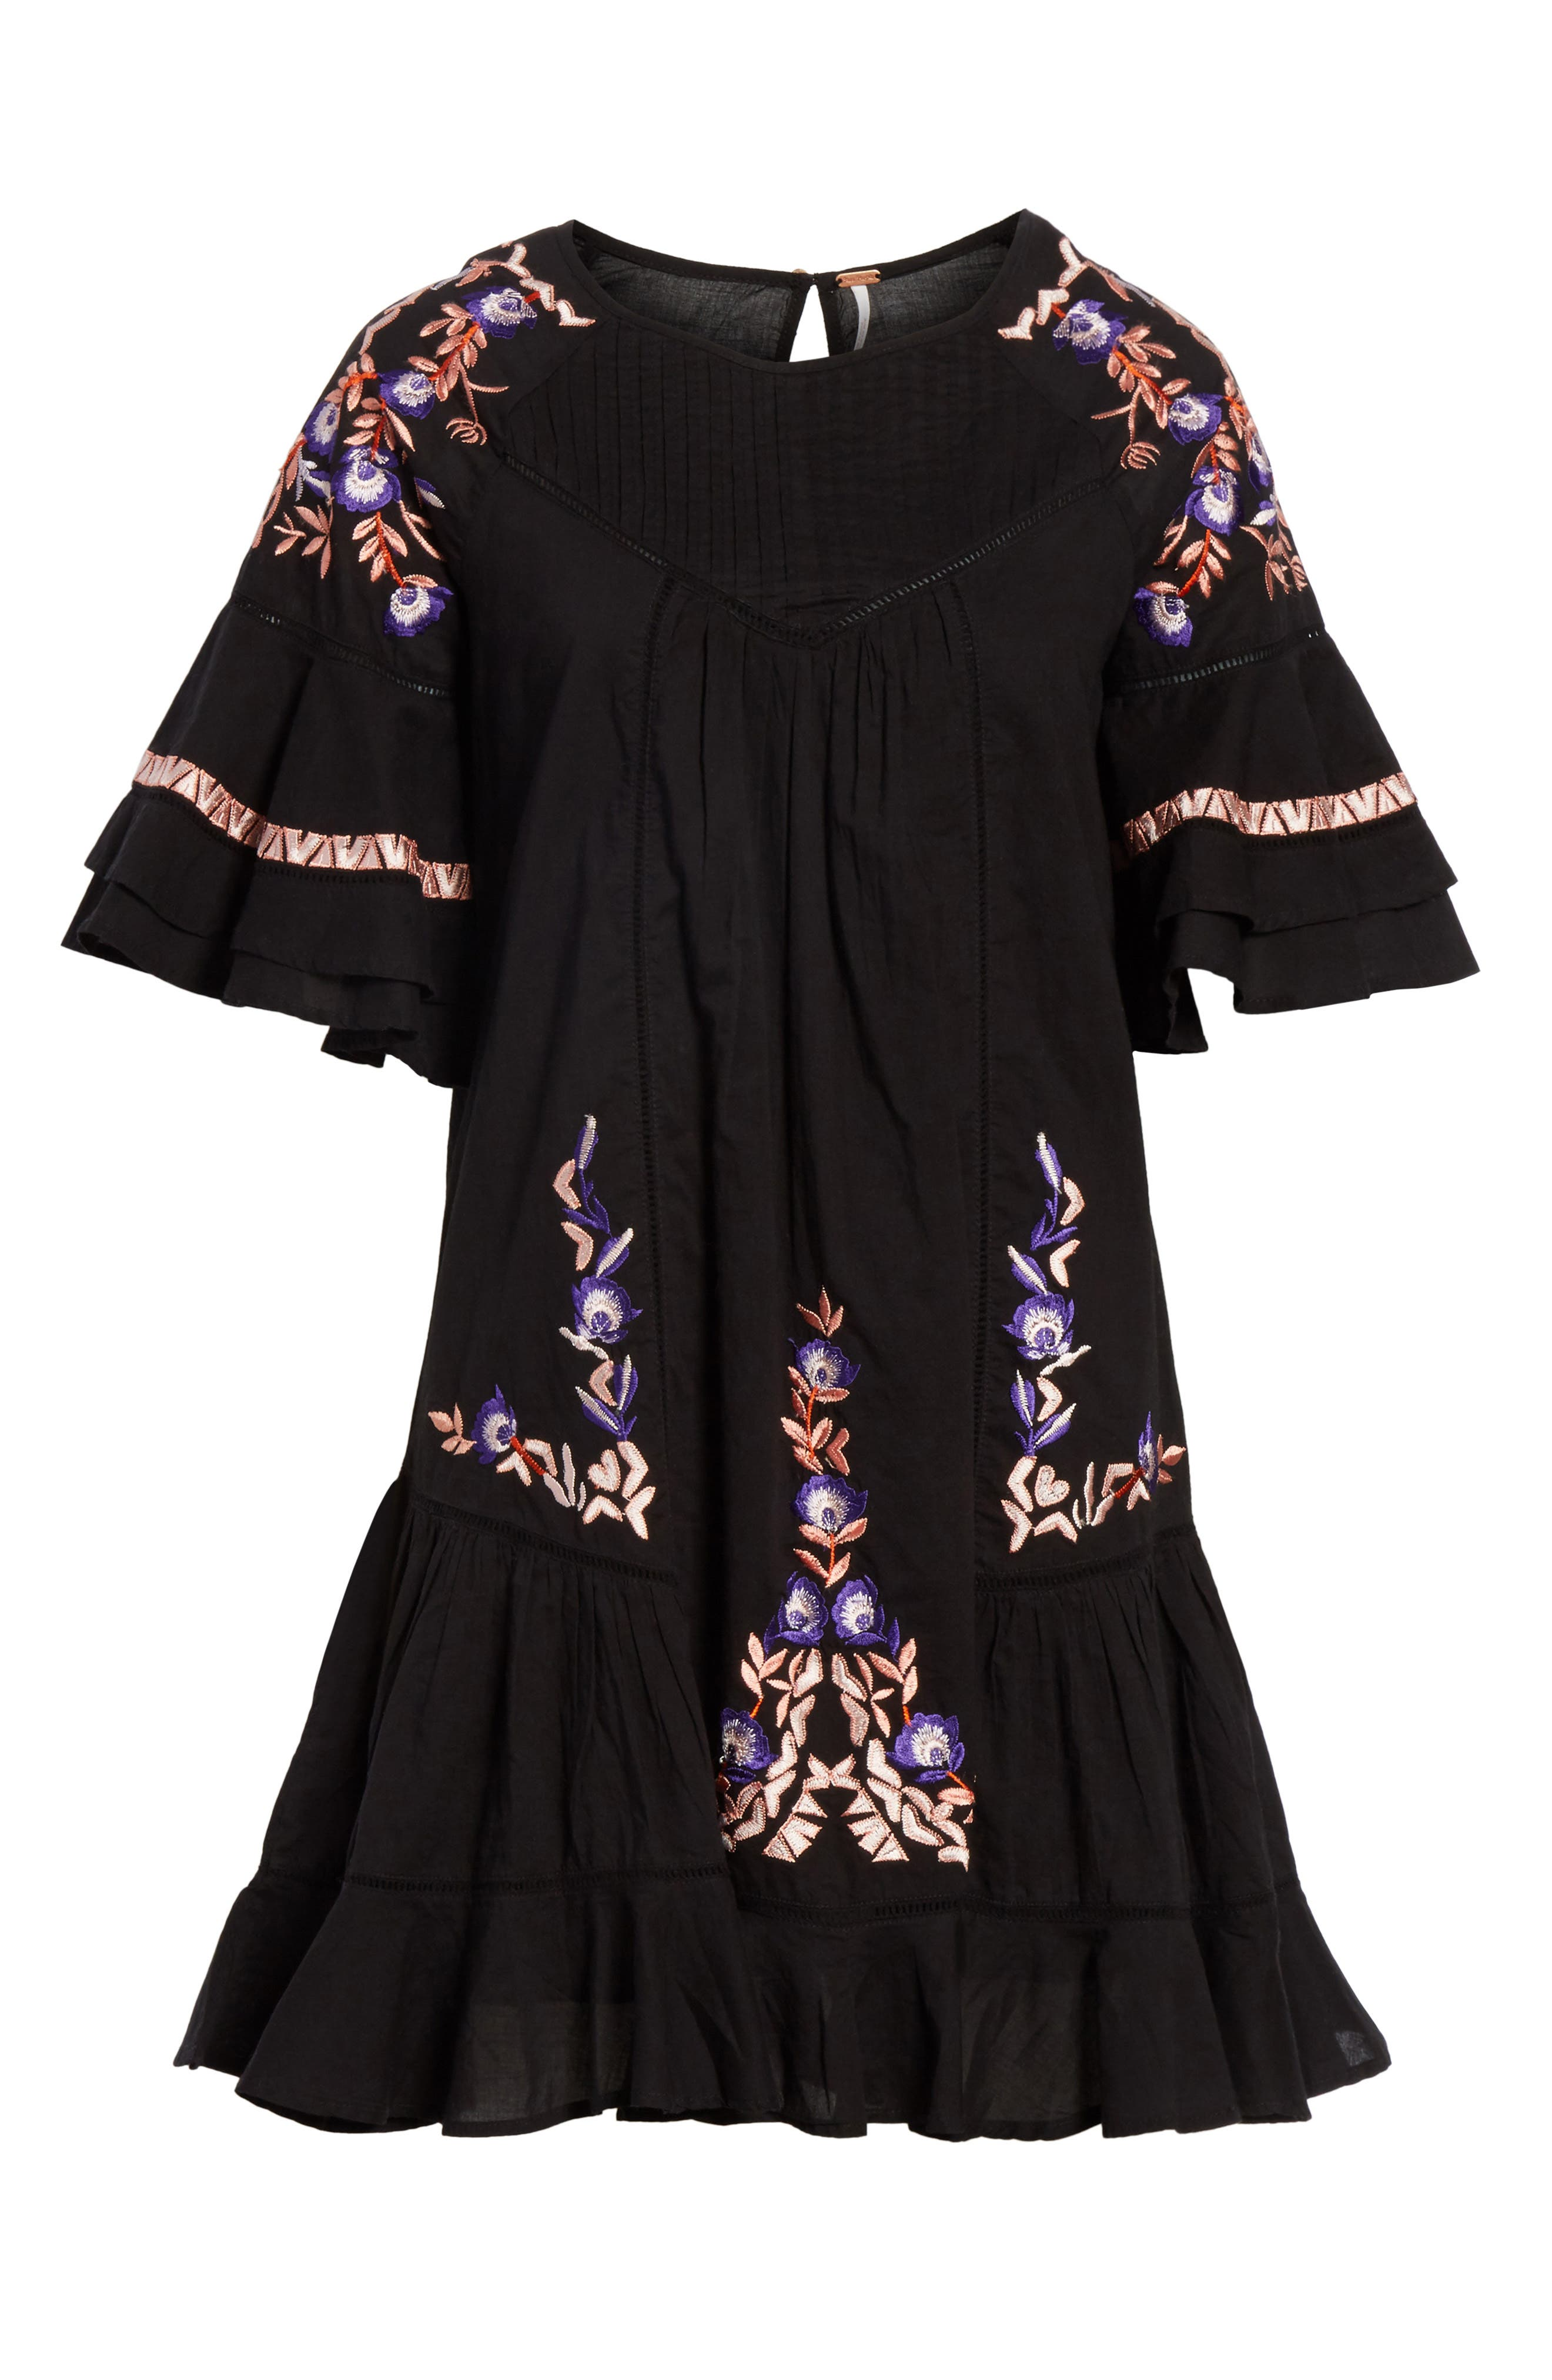 Pavlo Babydoll Dress,                             Alternate thumbnail 7, color,                             Black